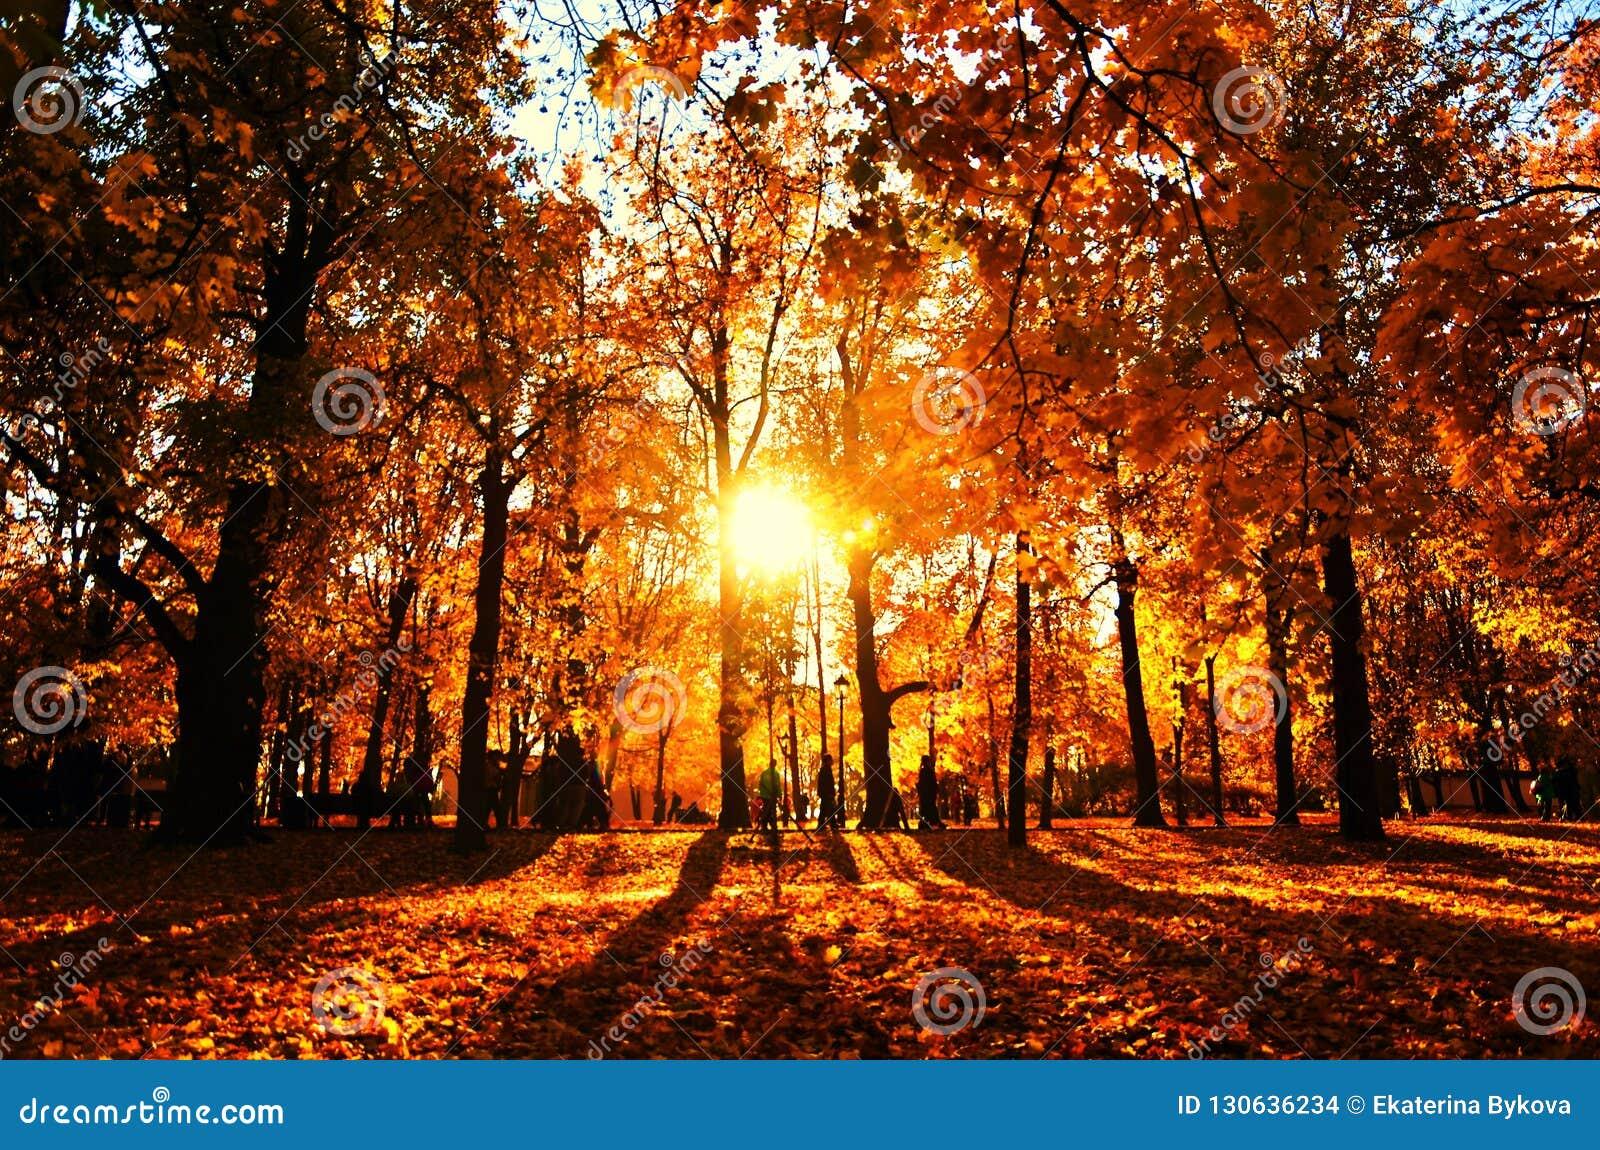 Autumn nature of Kolomenskoye park in Moscow.